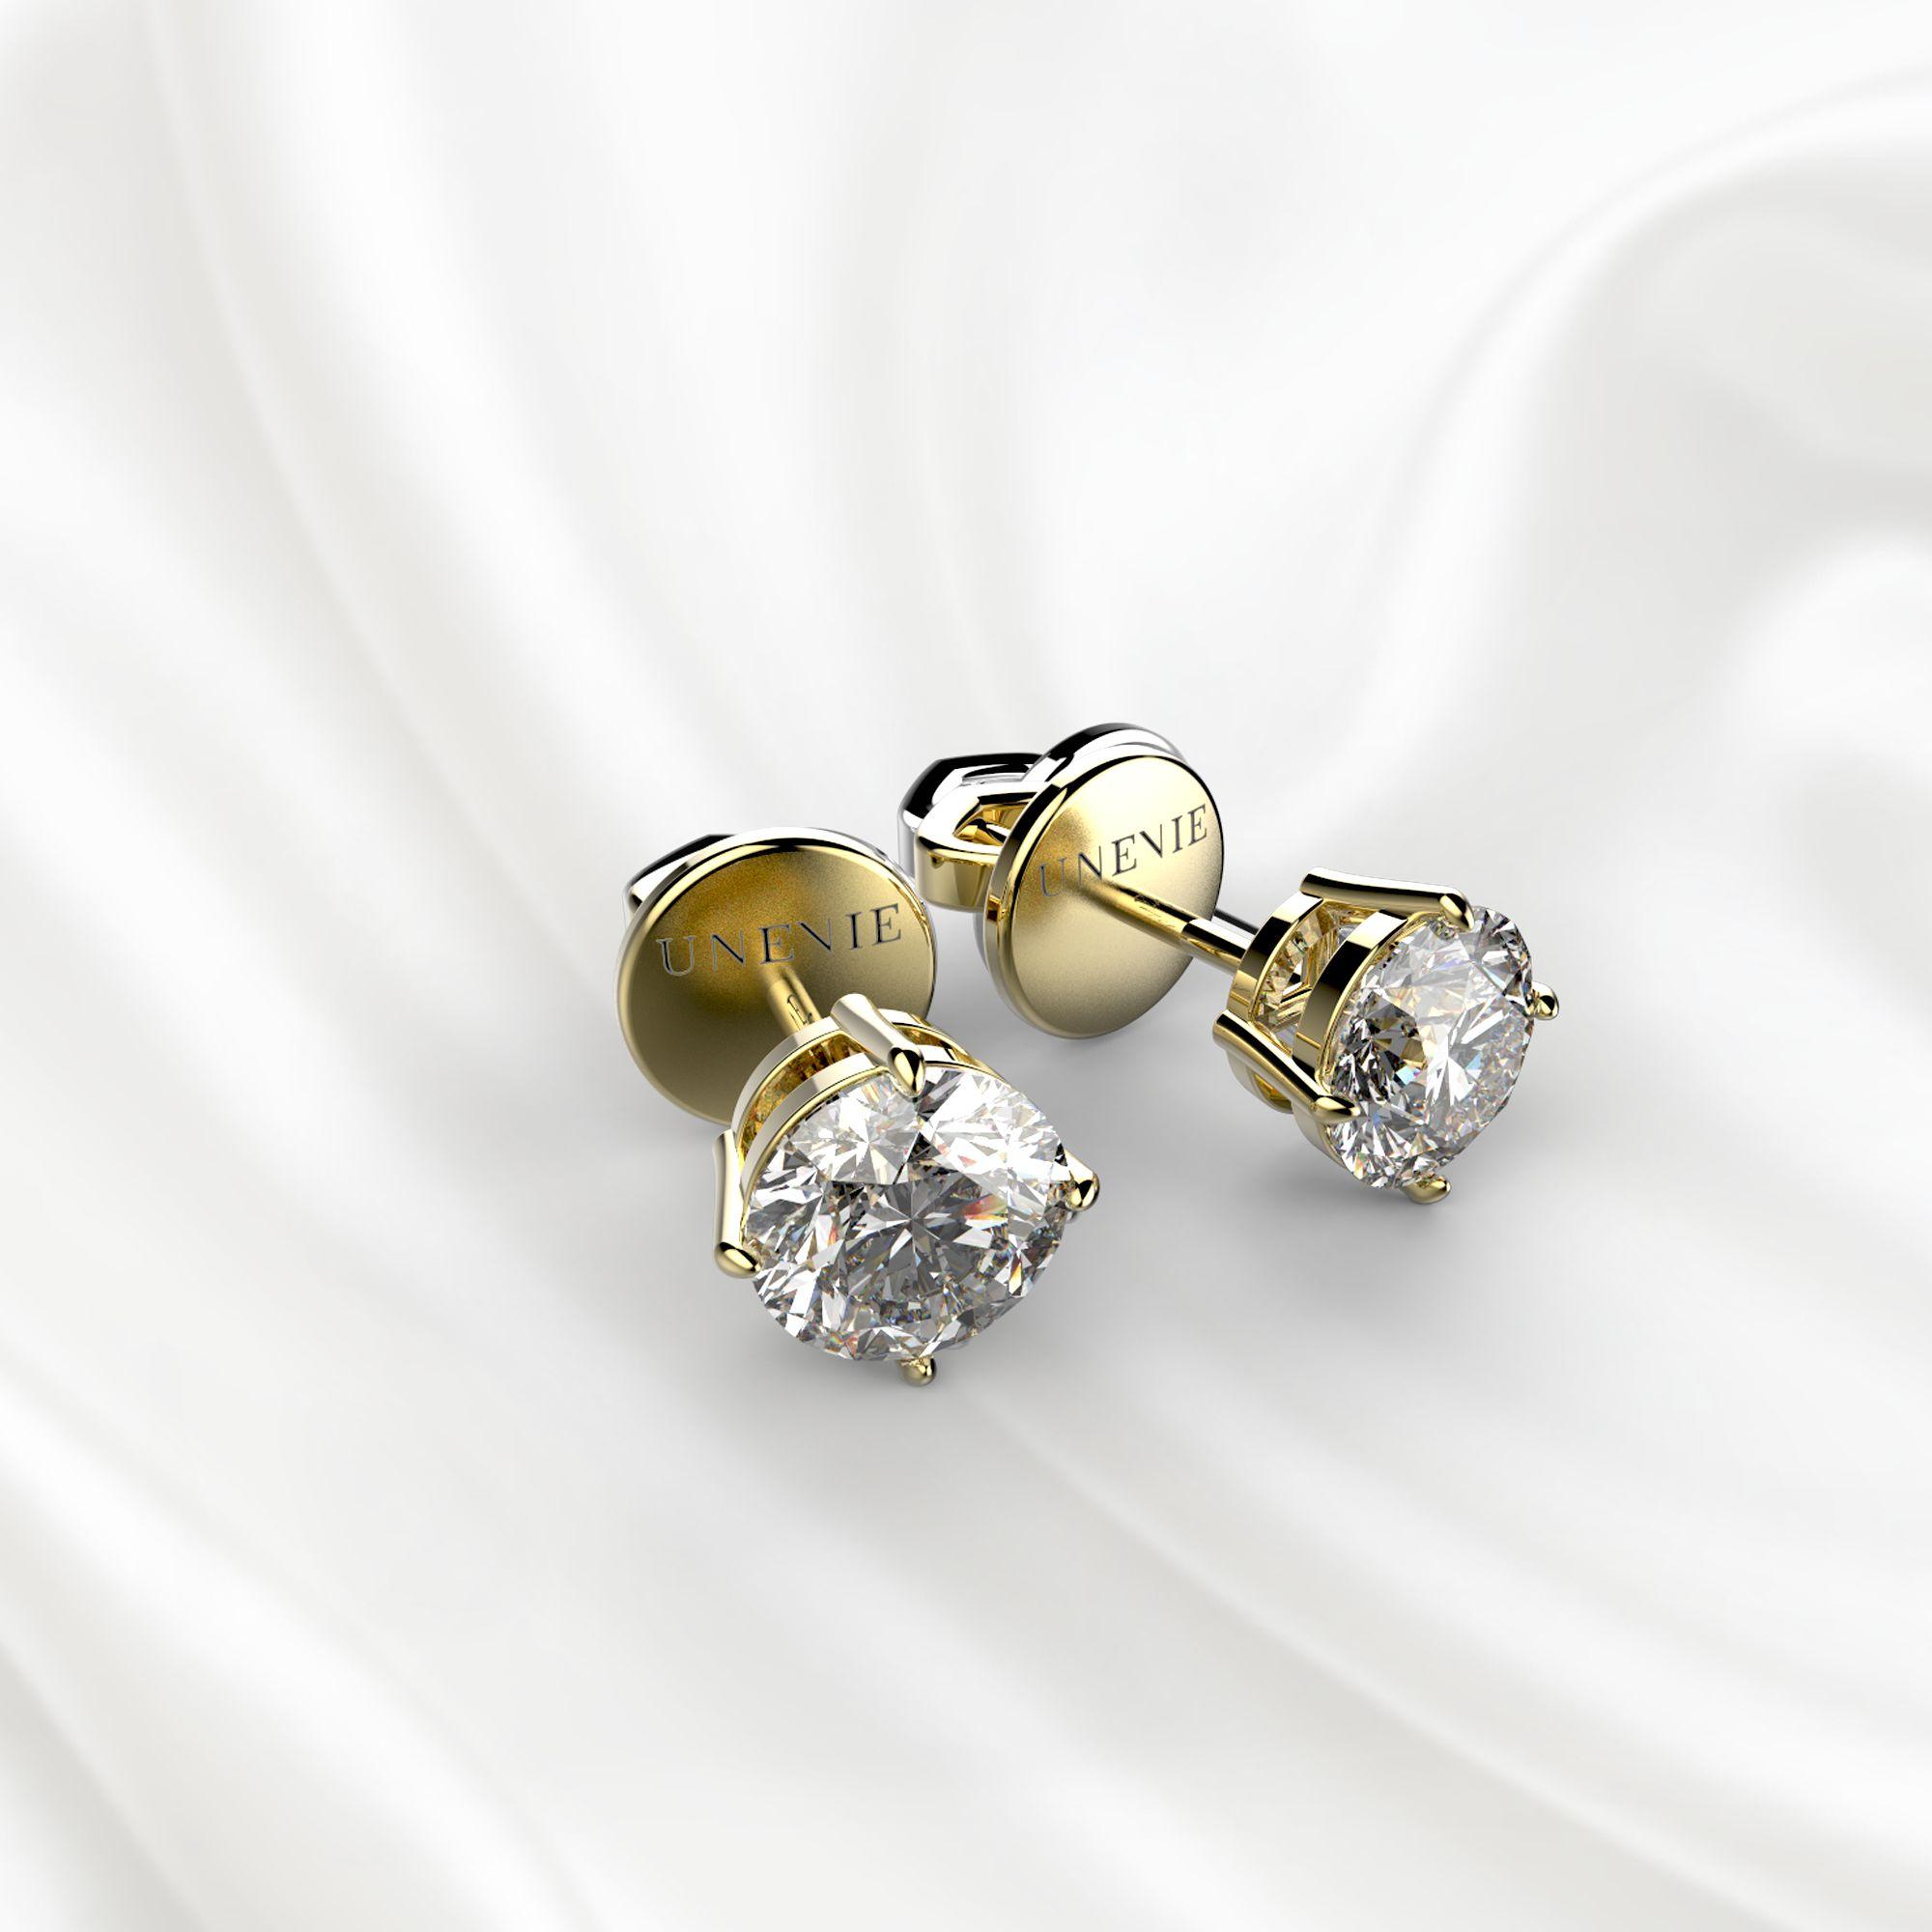 S3 Серьги из желтого золота с бриллиантами 0,6 карат